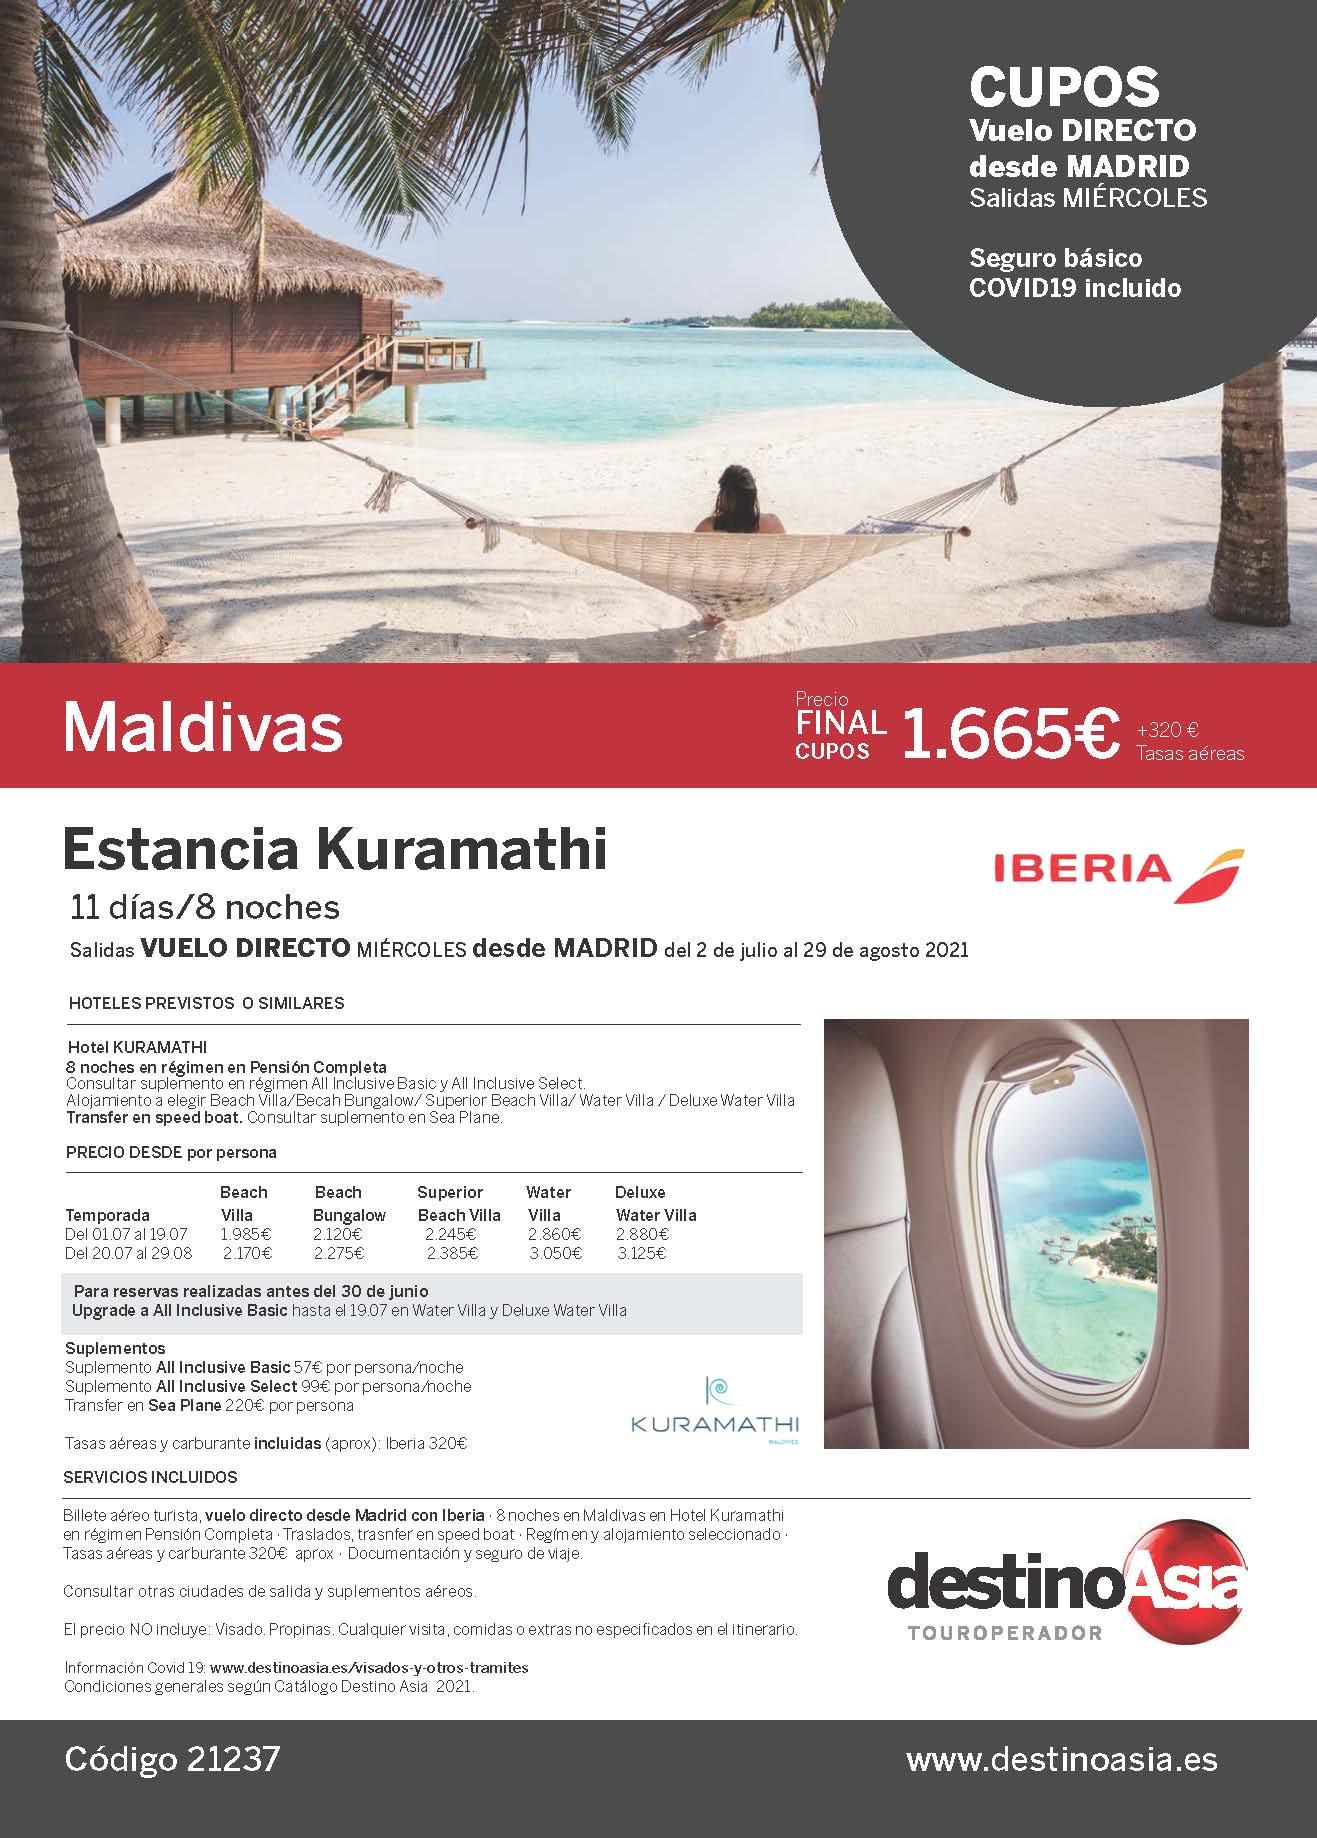 Oferta Destino Asia Estancia en Kuramathi Maldivas 2021 cupos vuelo directo desde Madrid